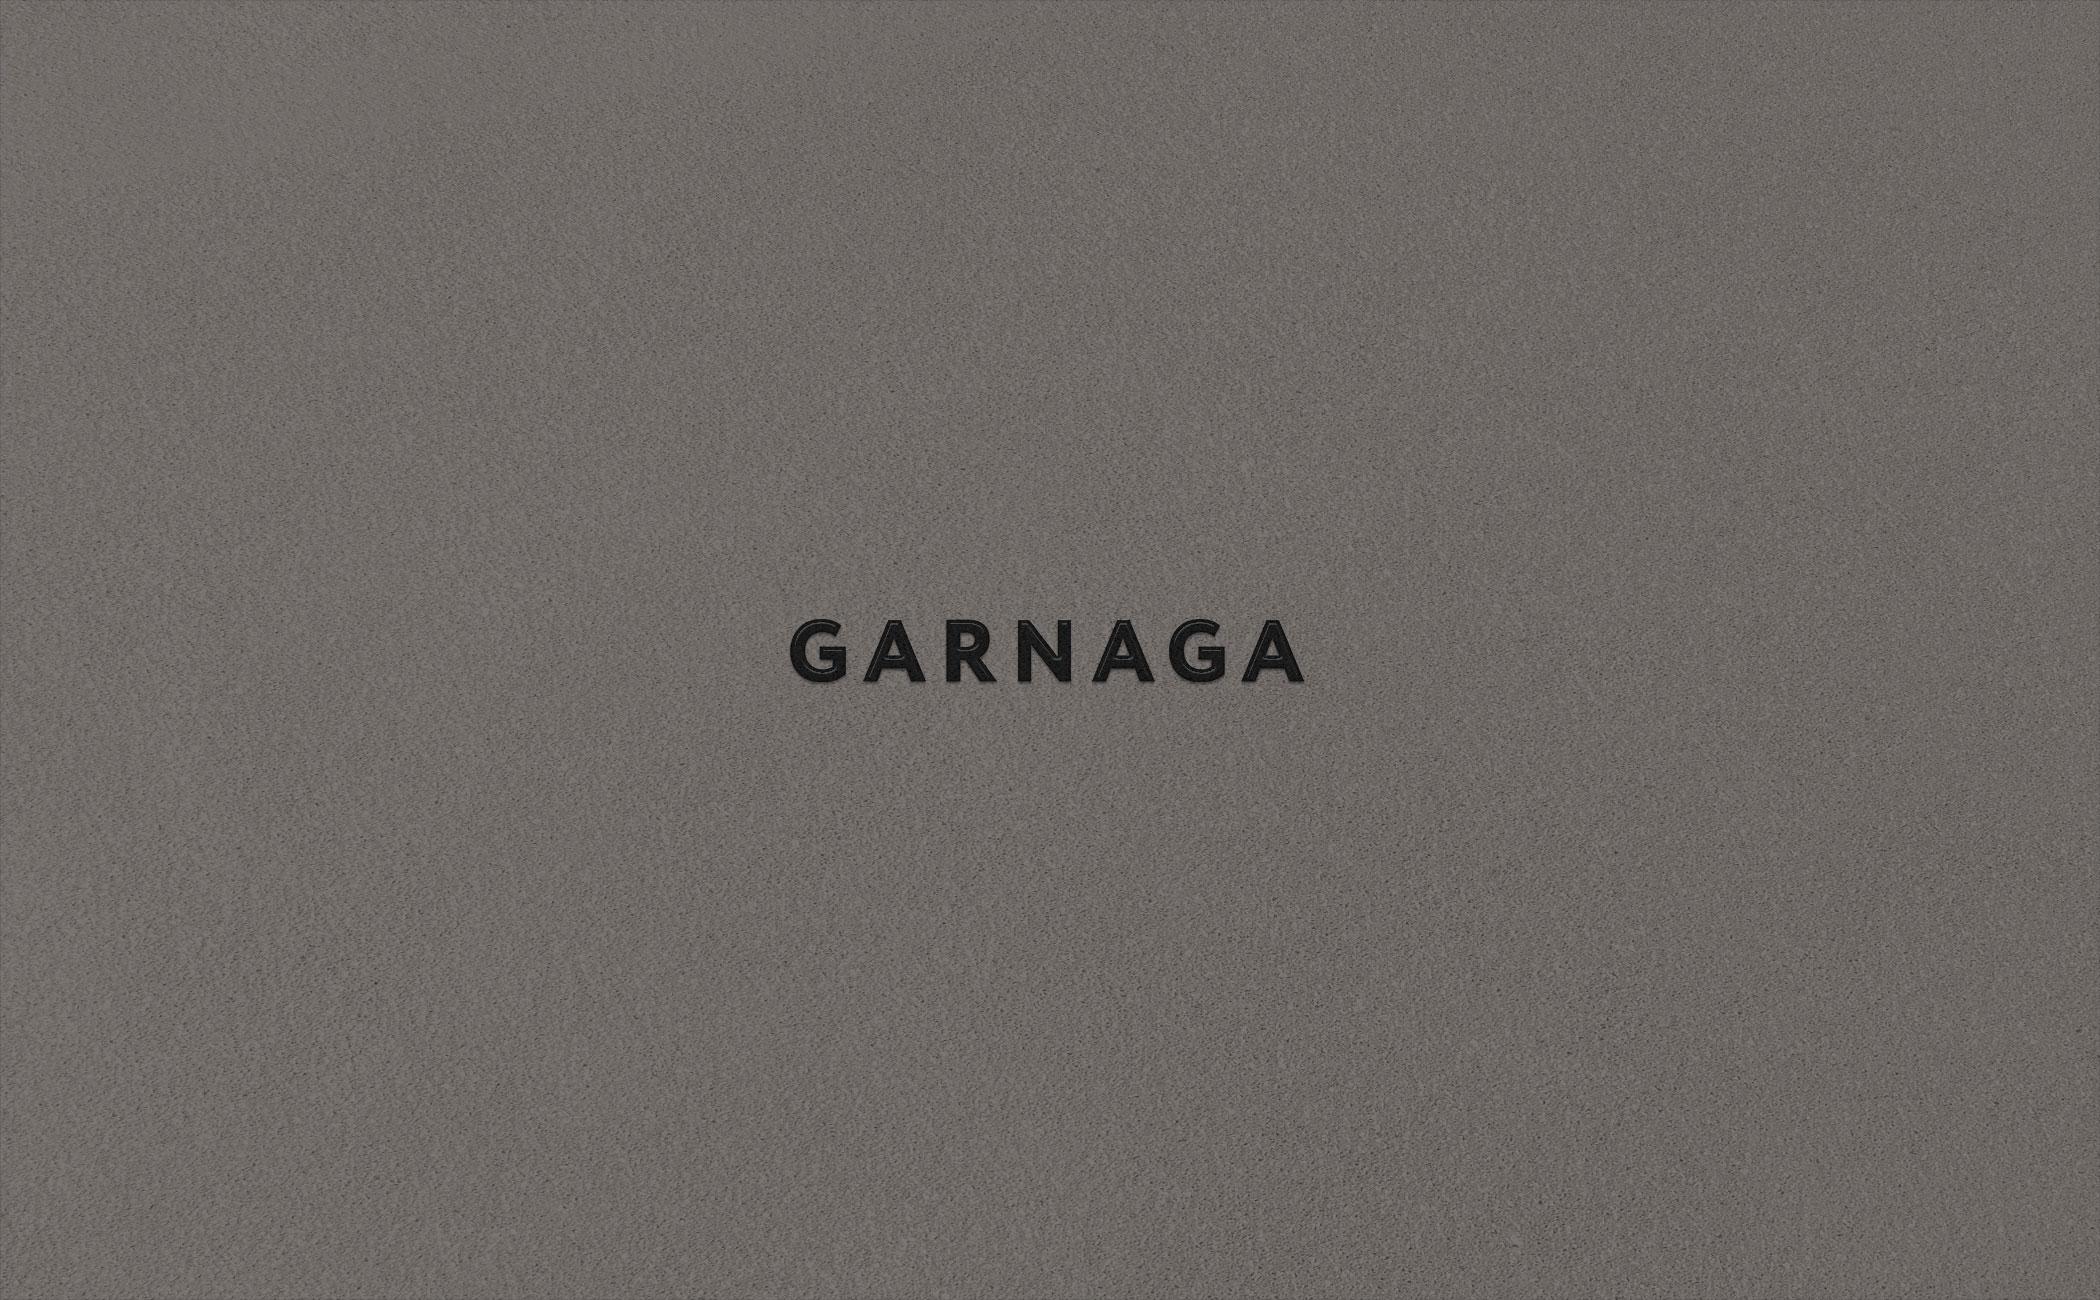 Garnaga_preview_01